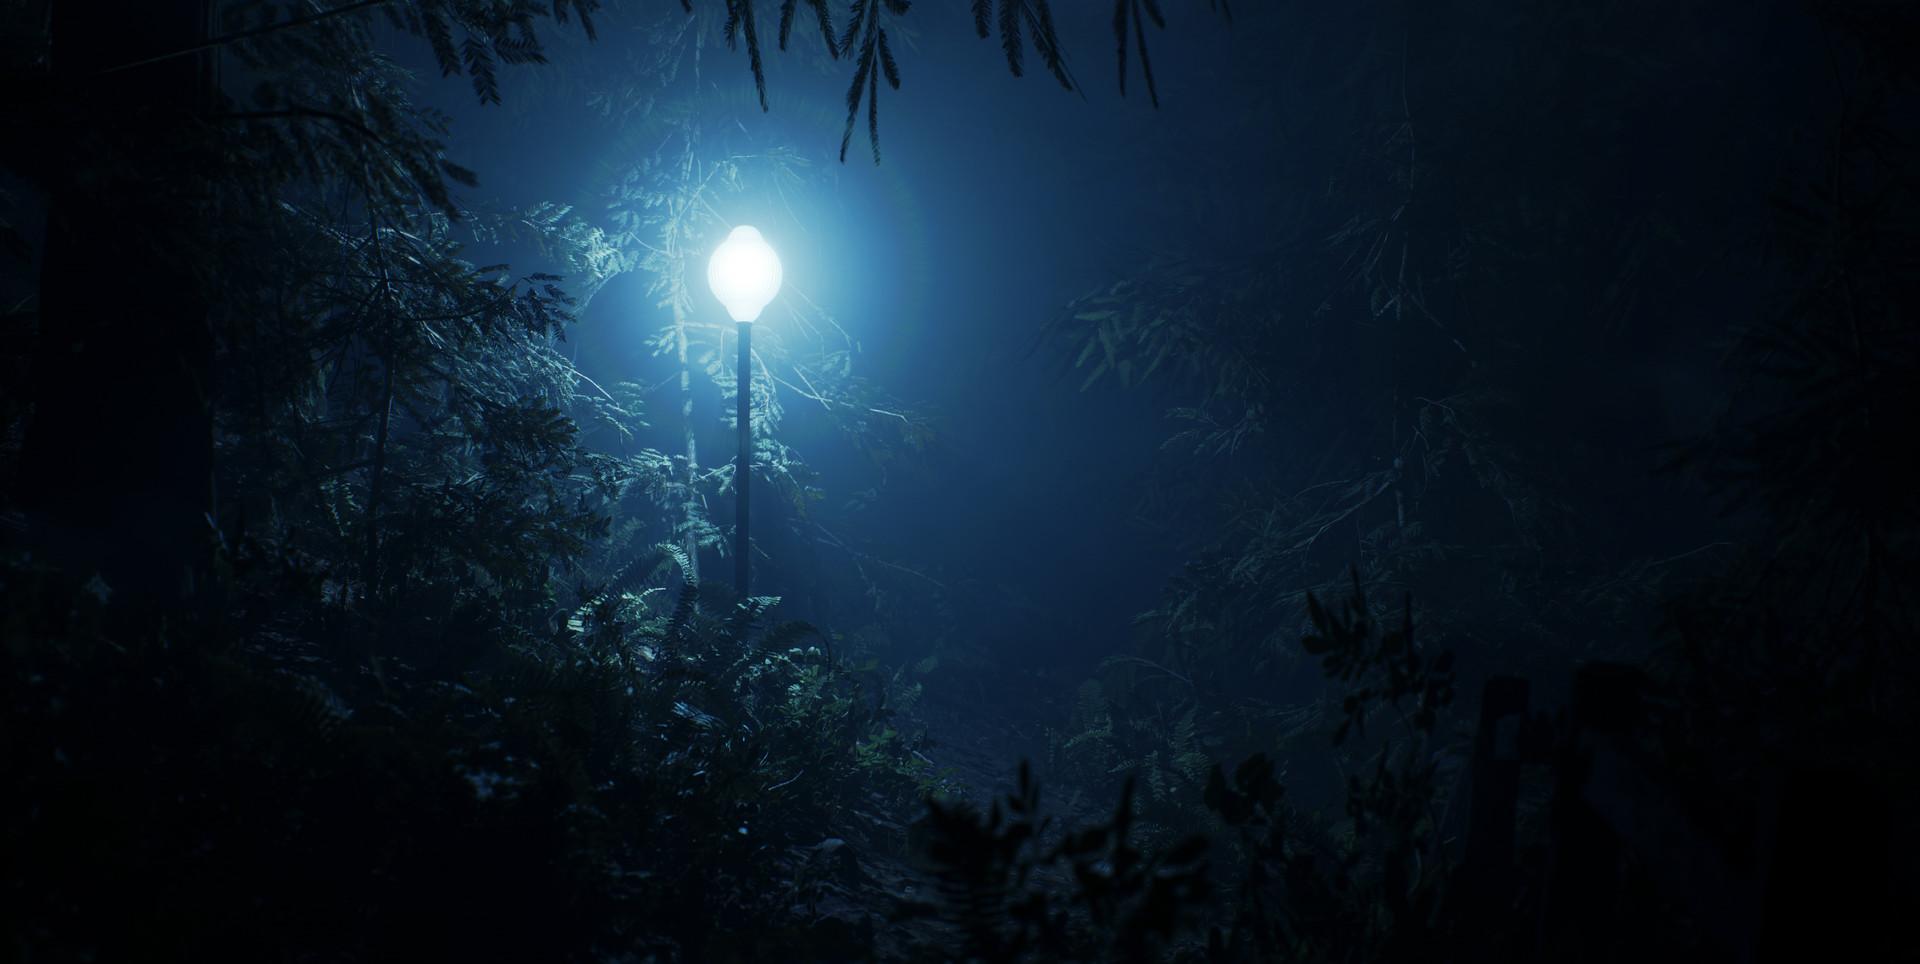 Alexander dracott forestlights 01